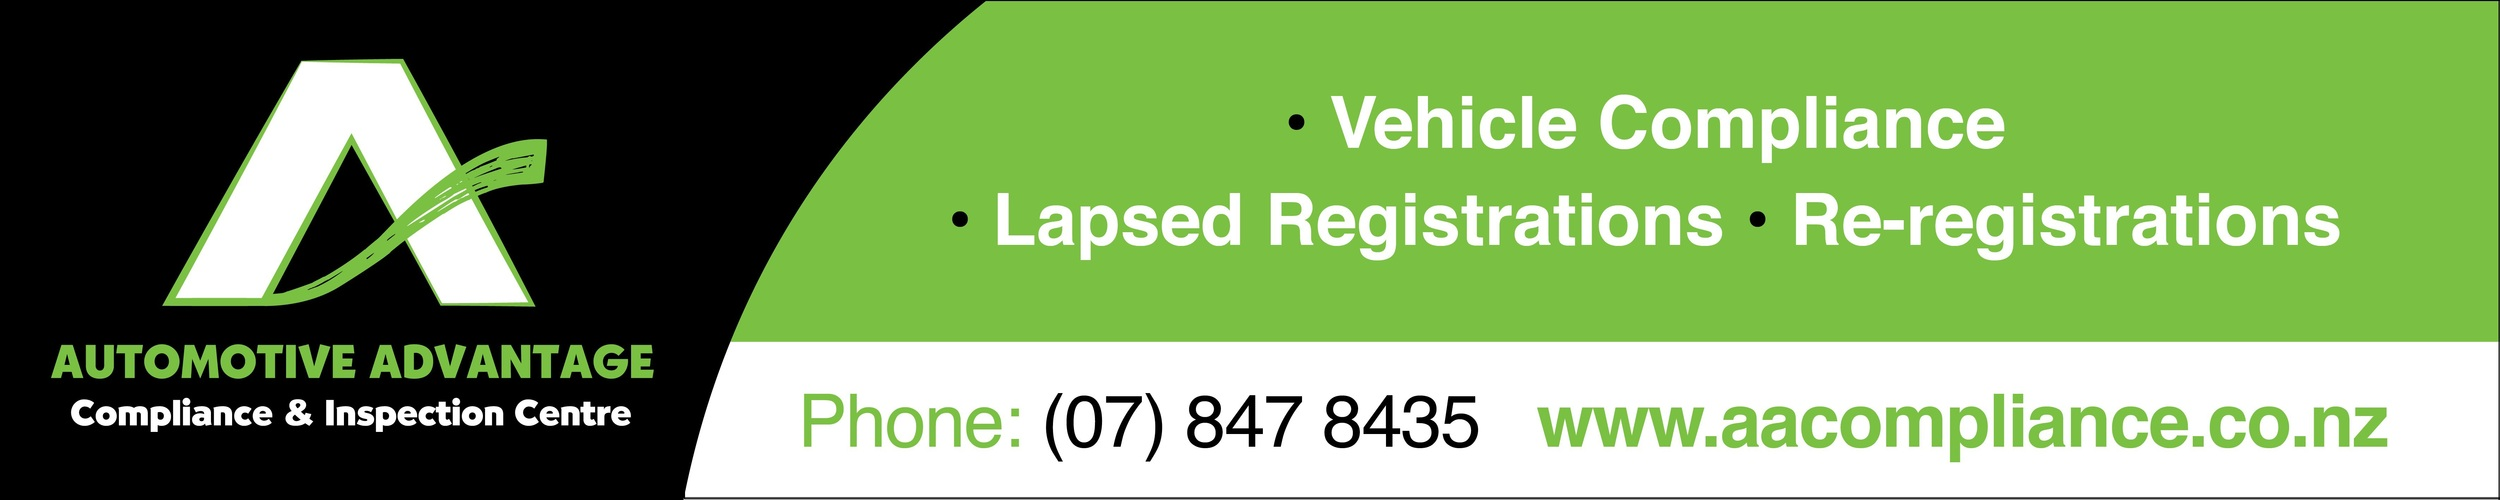 8928_Ideal_Cars_aa_compliance_billboard_2.jpg